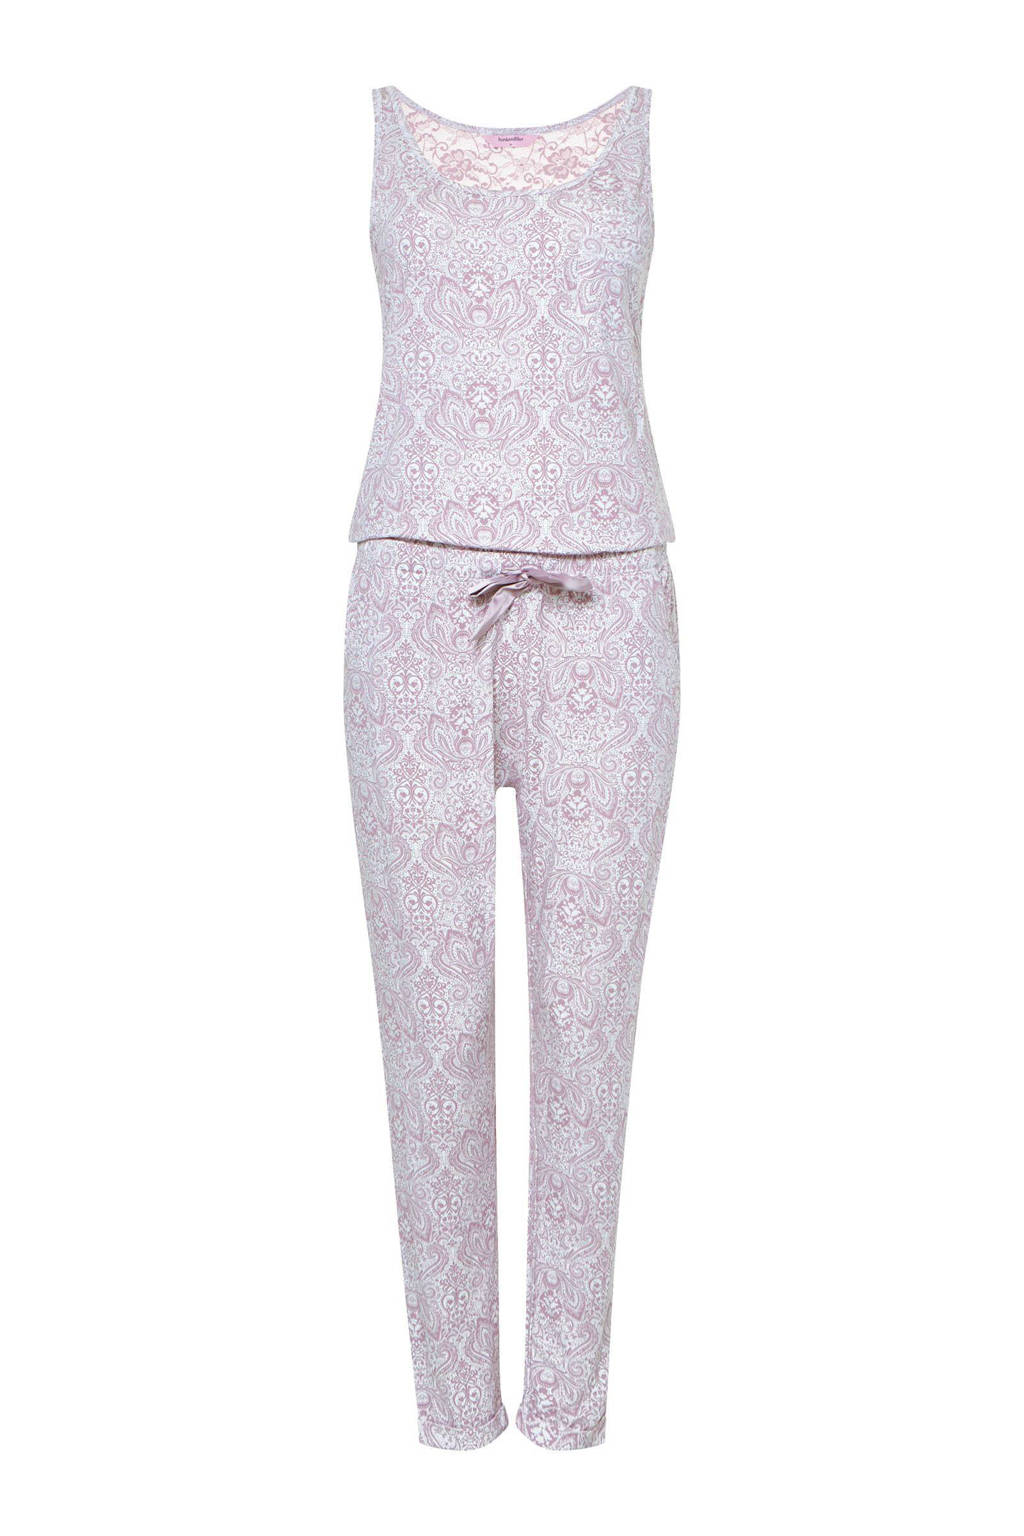 dace692e5ea Hunkemöller Hunkemoller pyjama jumpsuit